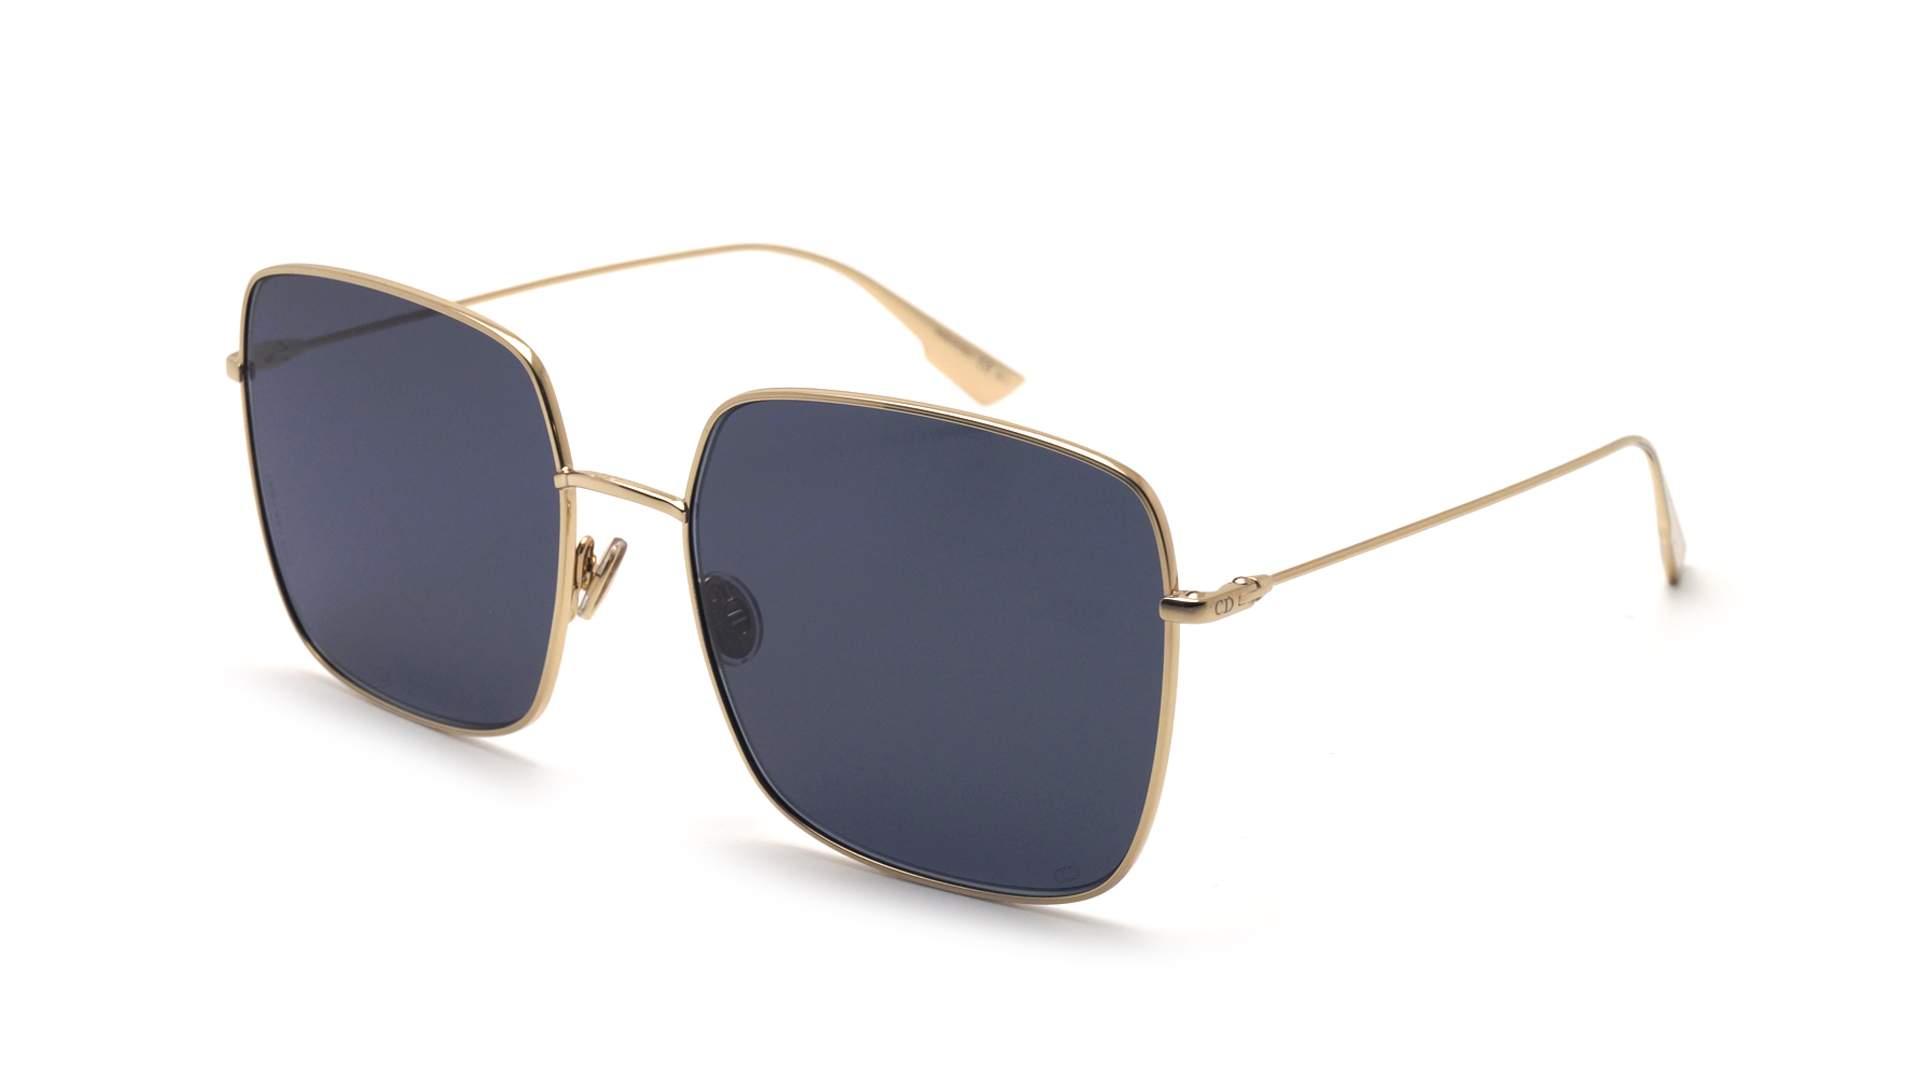 c3d4a90bb0 Sunglasses Dior Stellaire 1 Gold Matte DIORSTELLAIRE1 LKSA9 59-18 Large